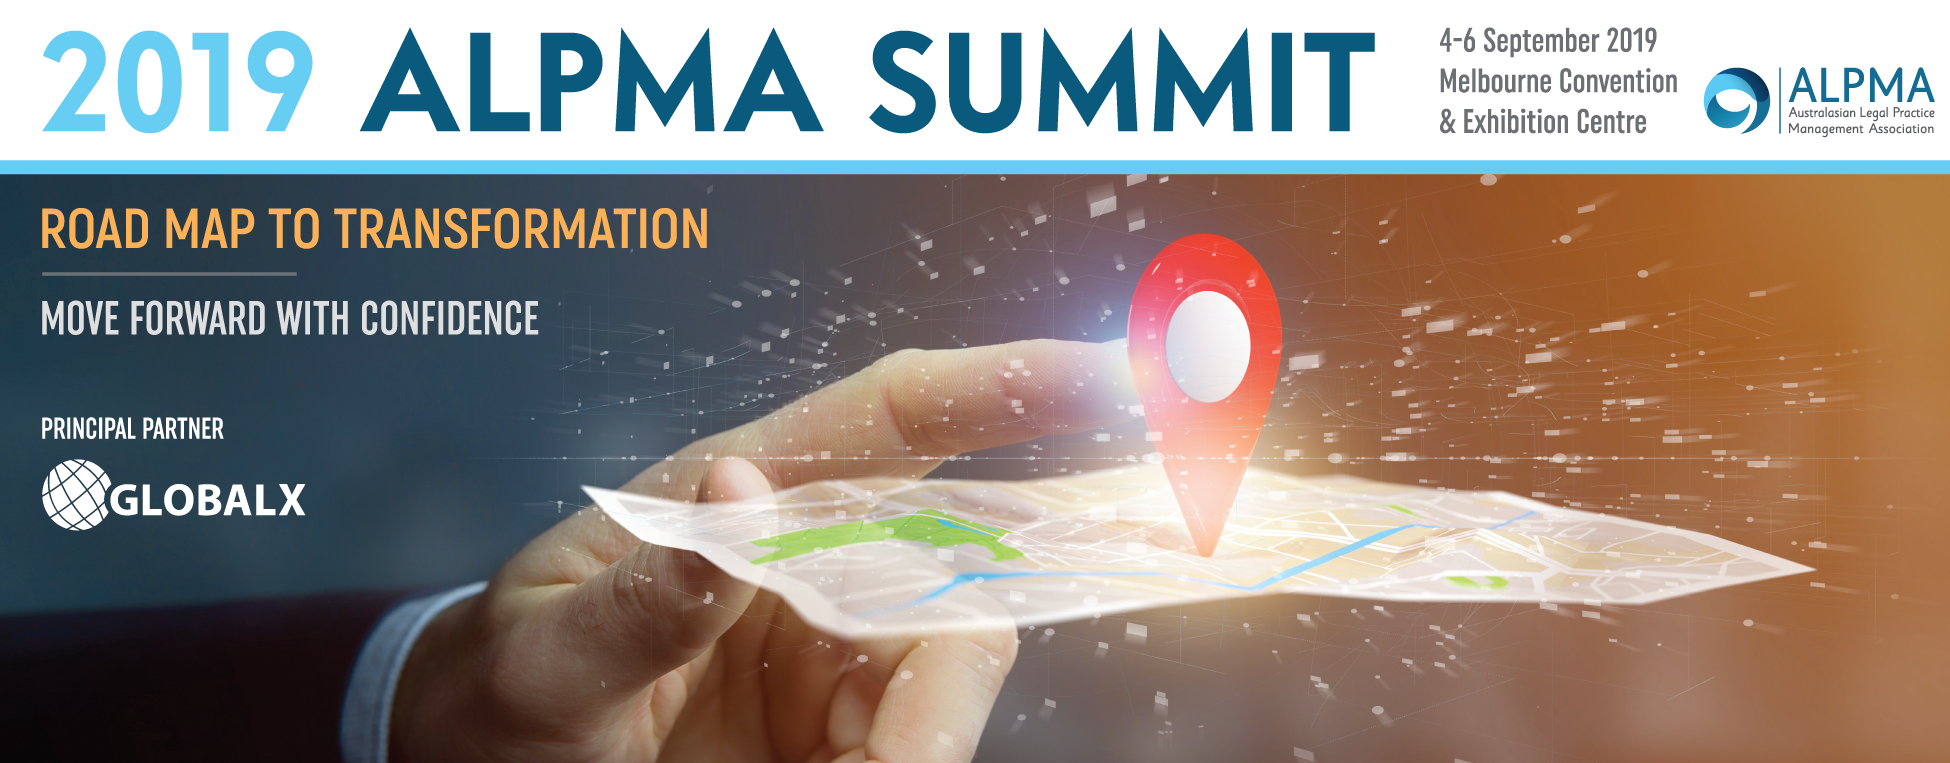 ALPMA-2019-Logo_website.png